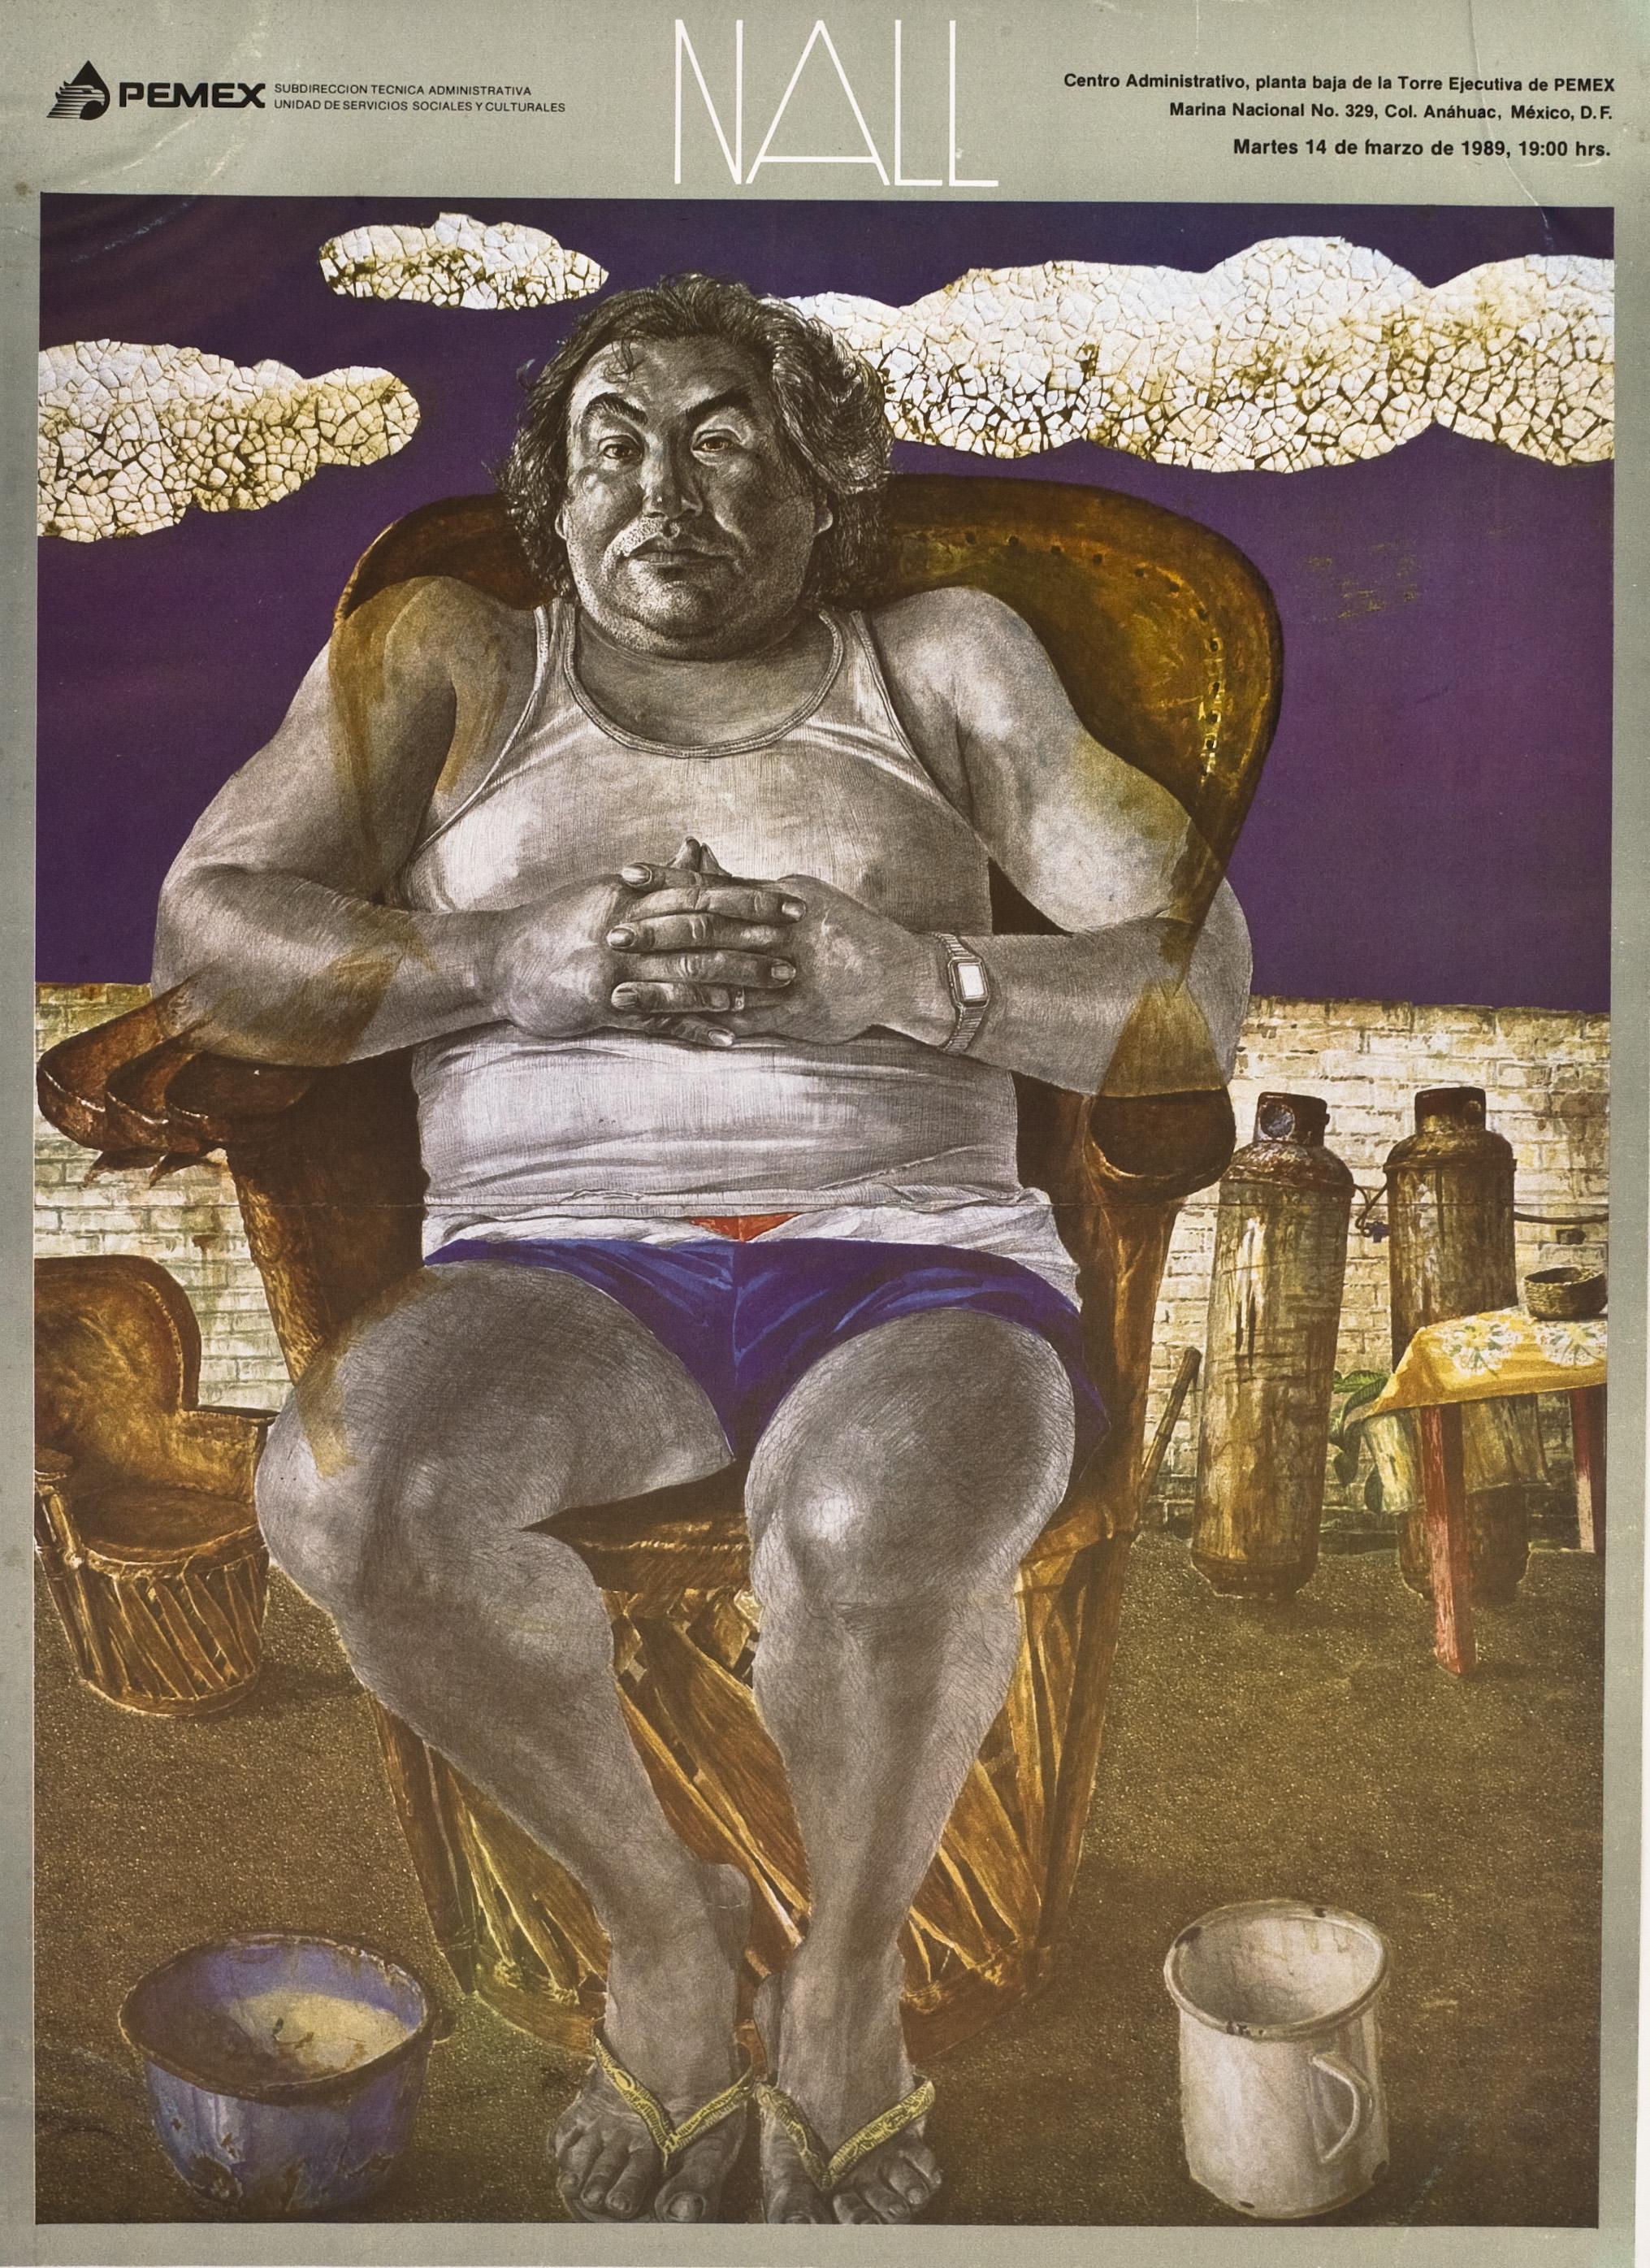 Nall Pemex - 1989